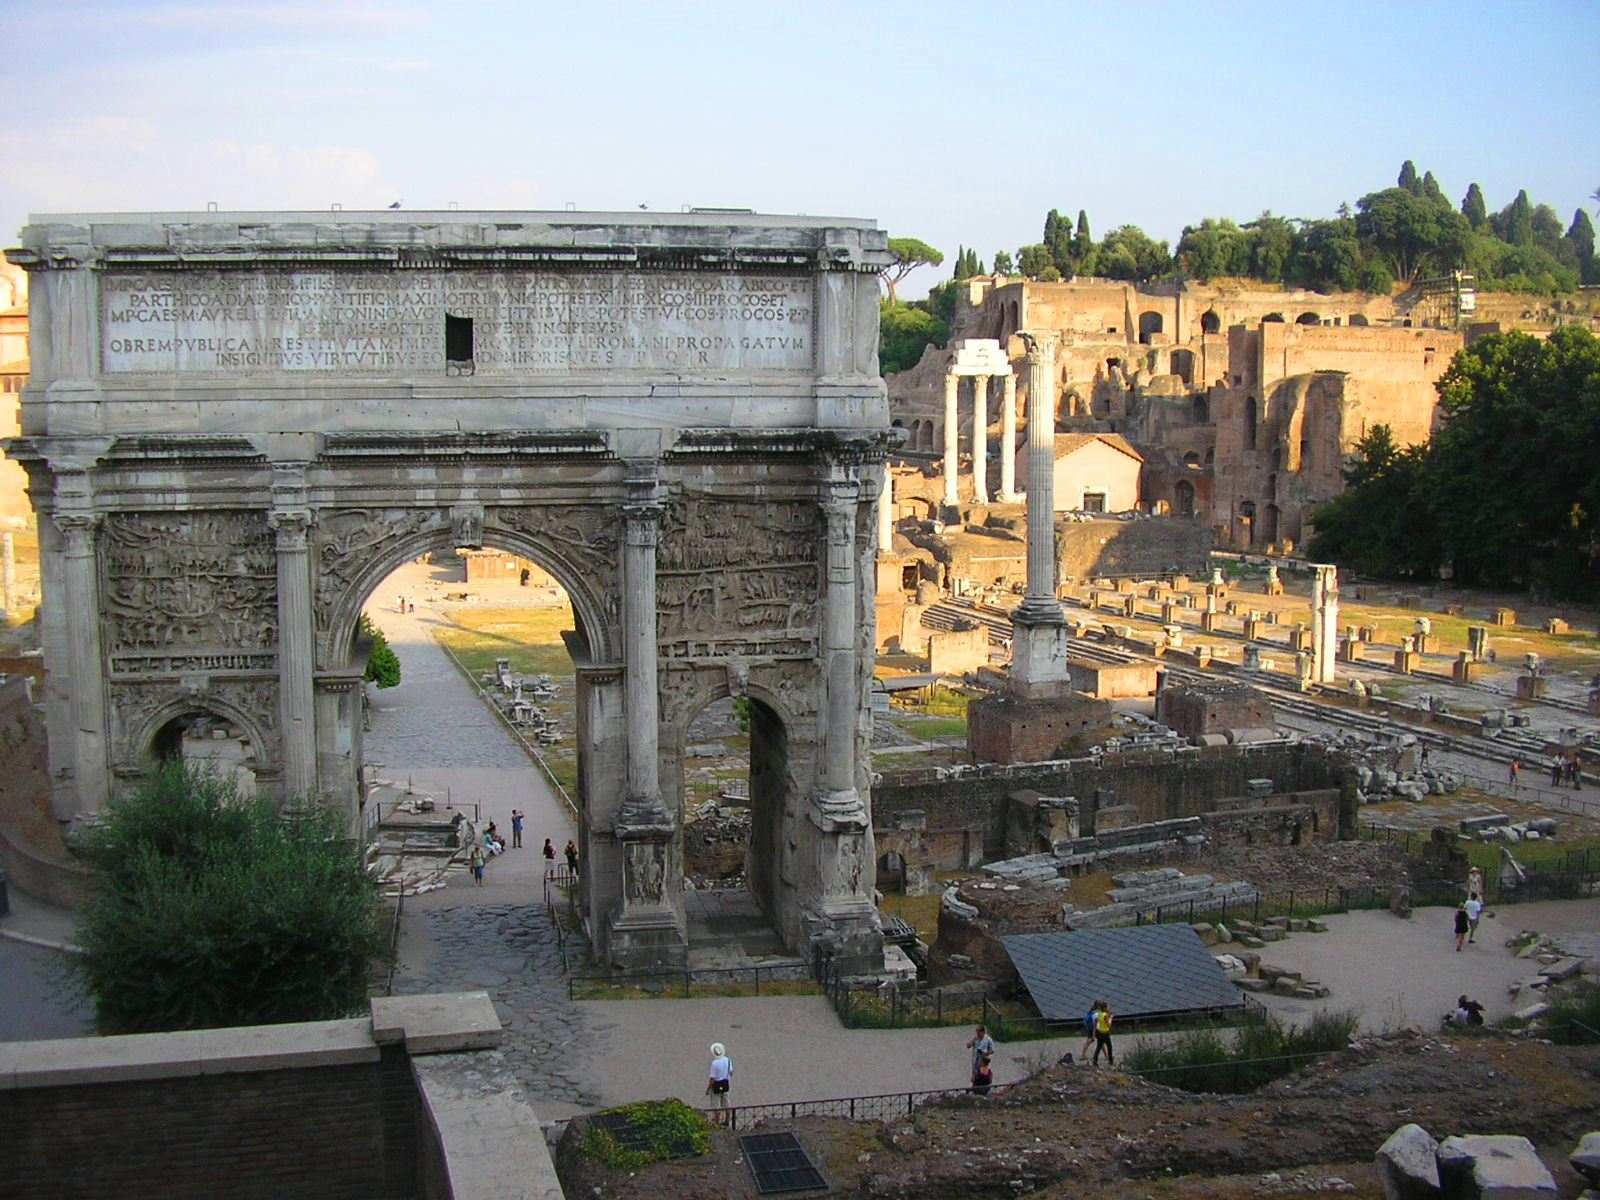 Natyss med -  https://commons.wikimedia.org/wiki/File:Arco_di_Settimio_Severo.JPG